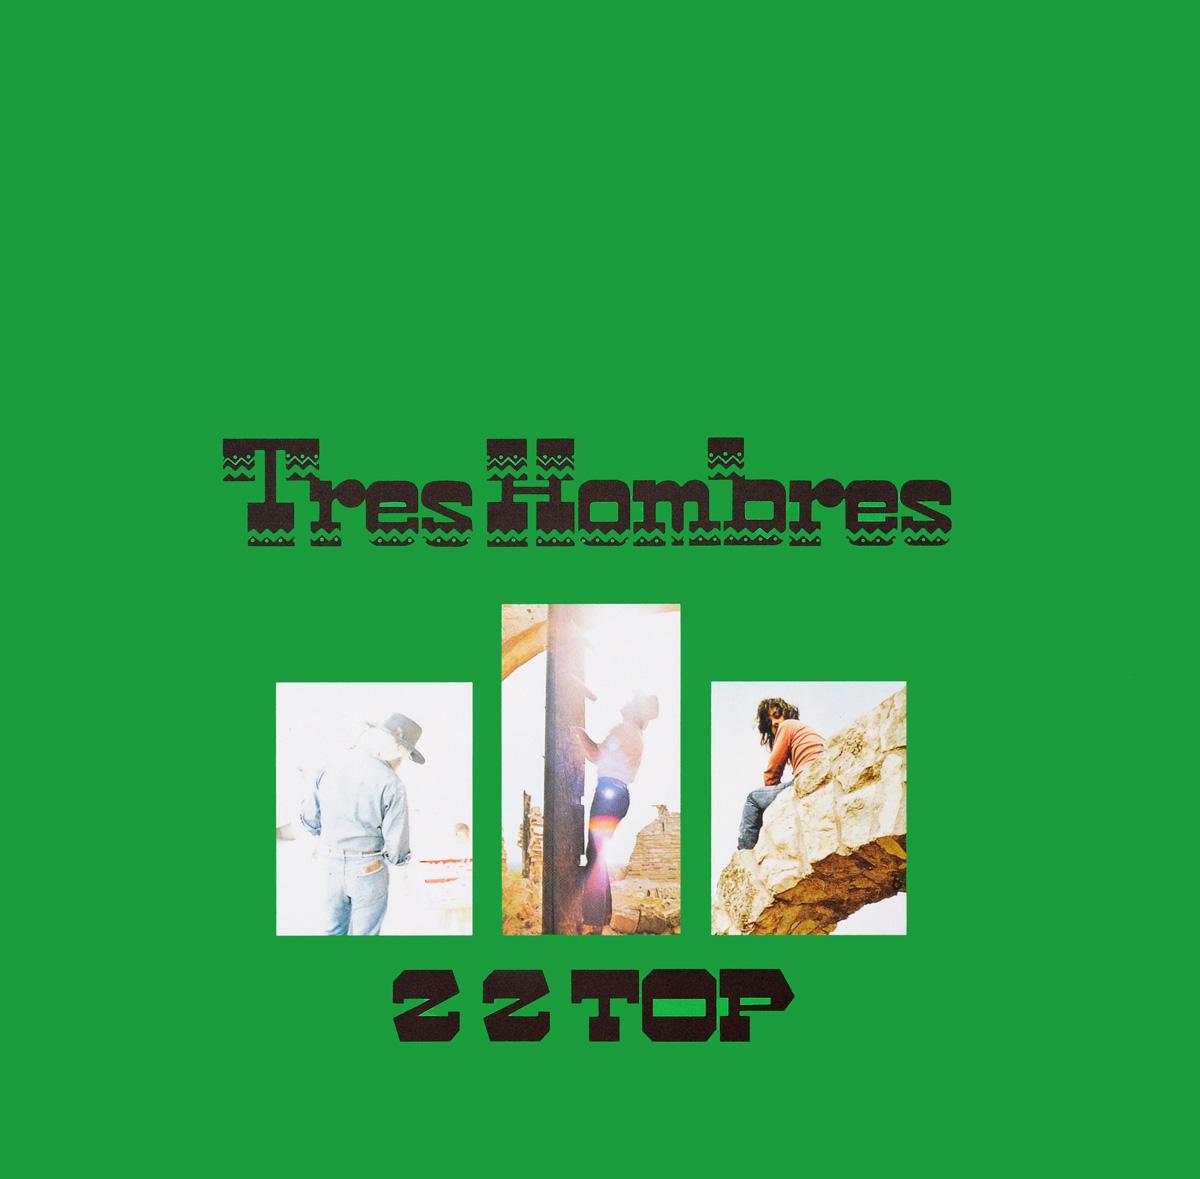 ZZ Top ZZ Top. Tres Hombres (LP) zz top zz top greatest hits